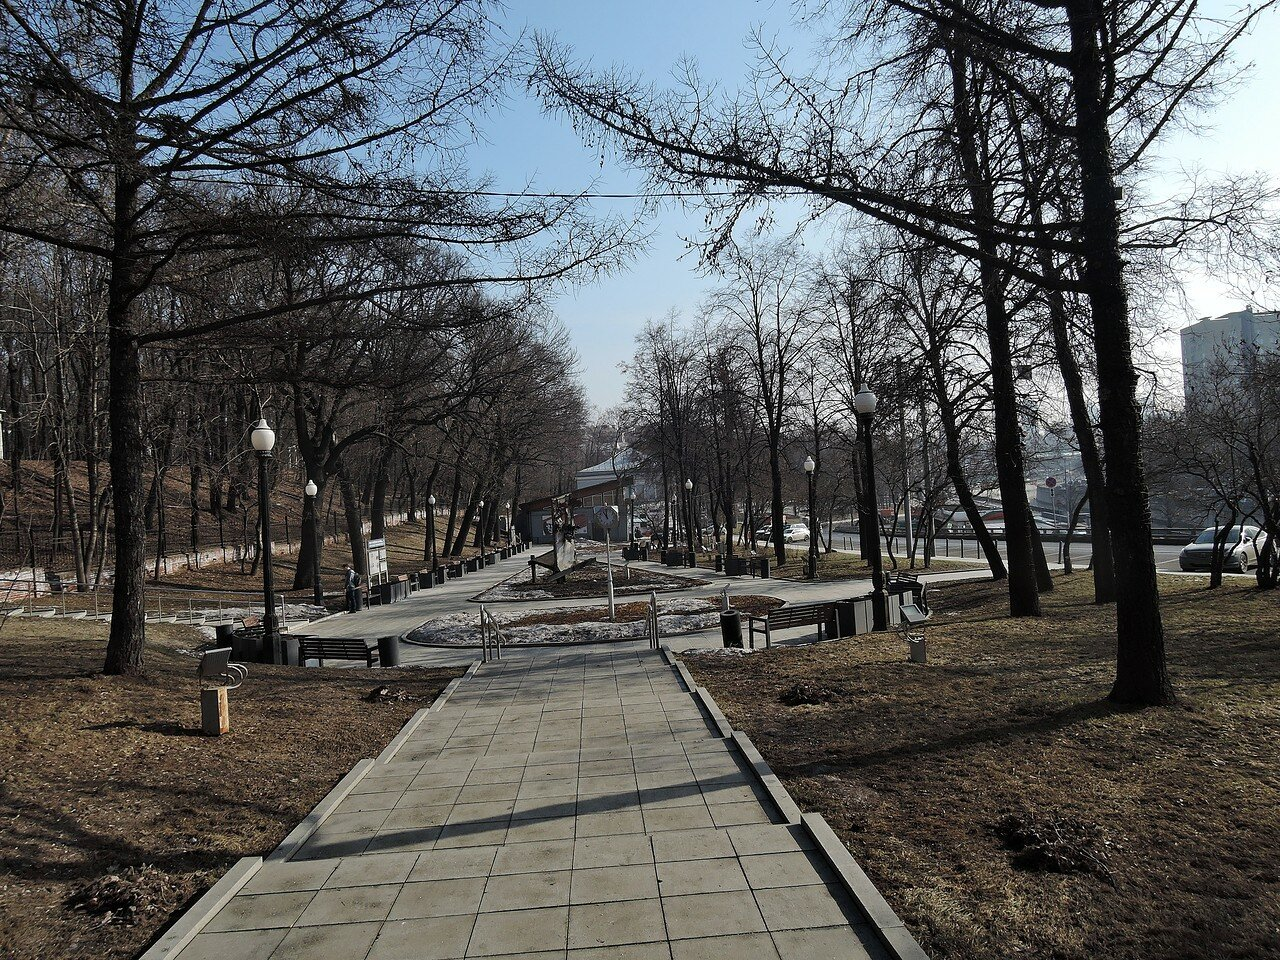 Сквер возле музея имени А.Д.Сахарова.